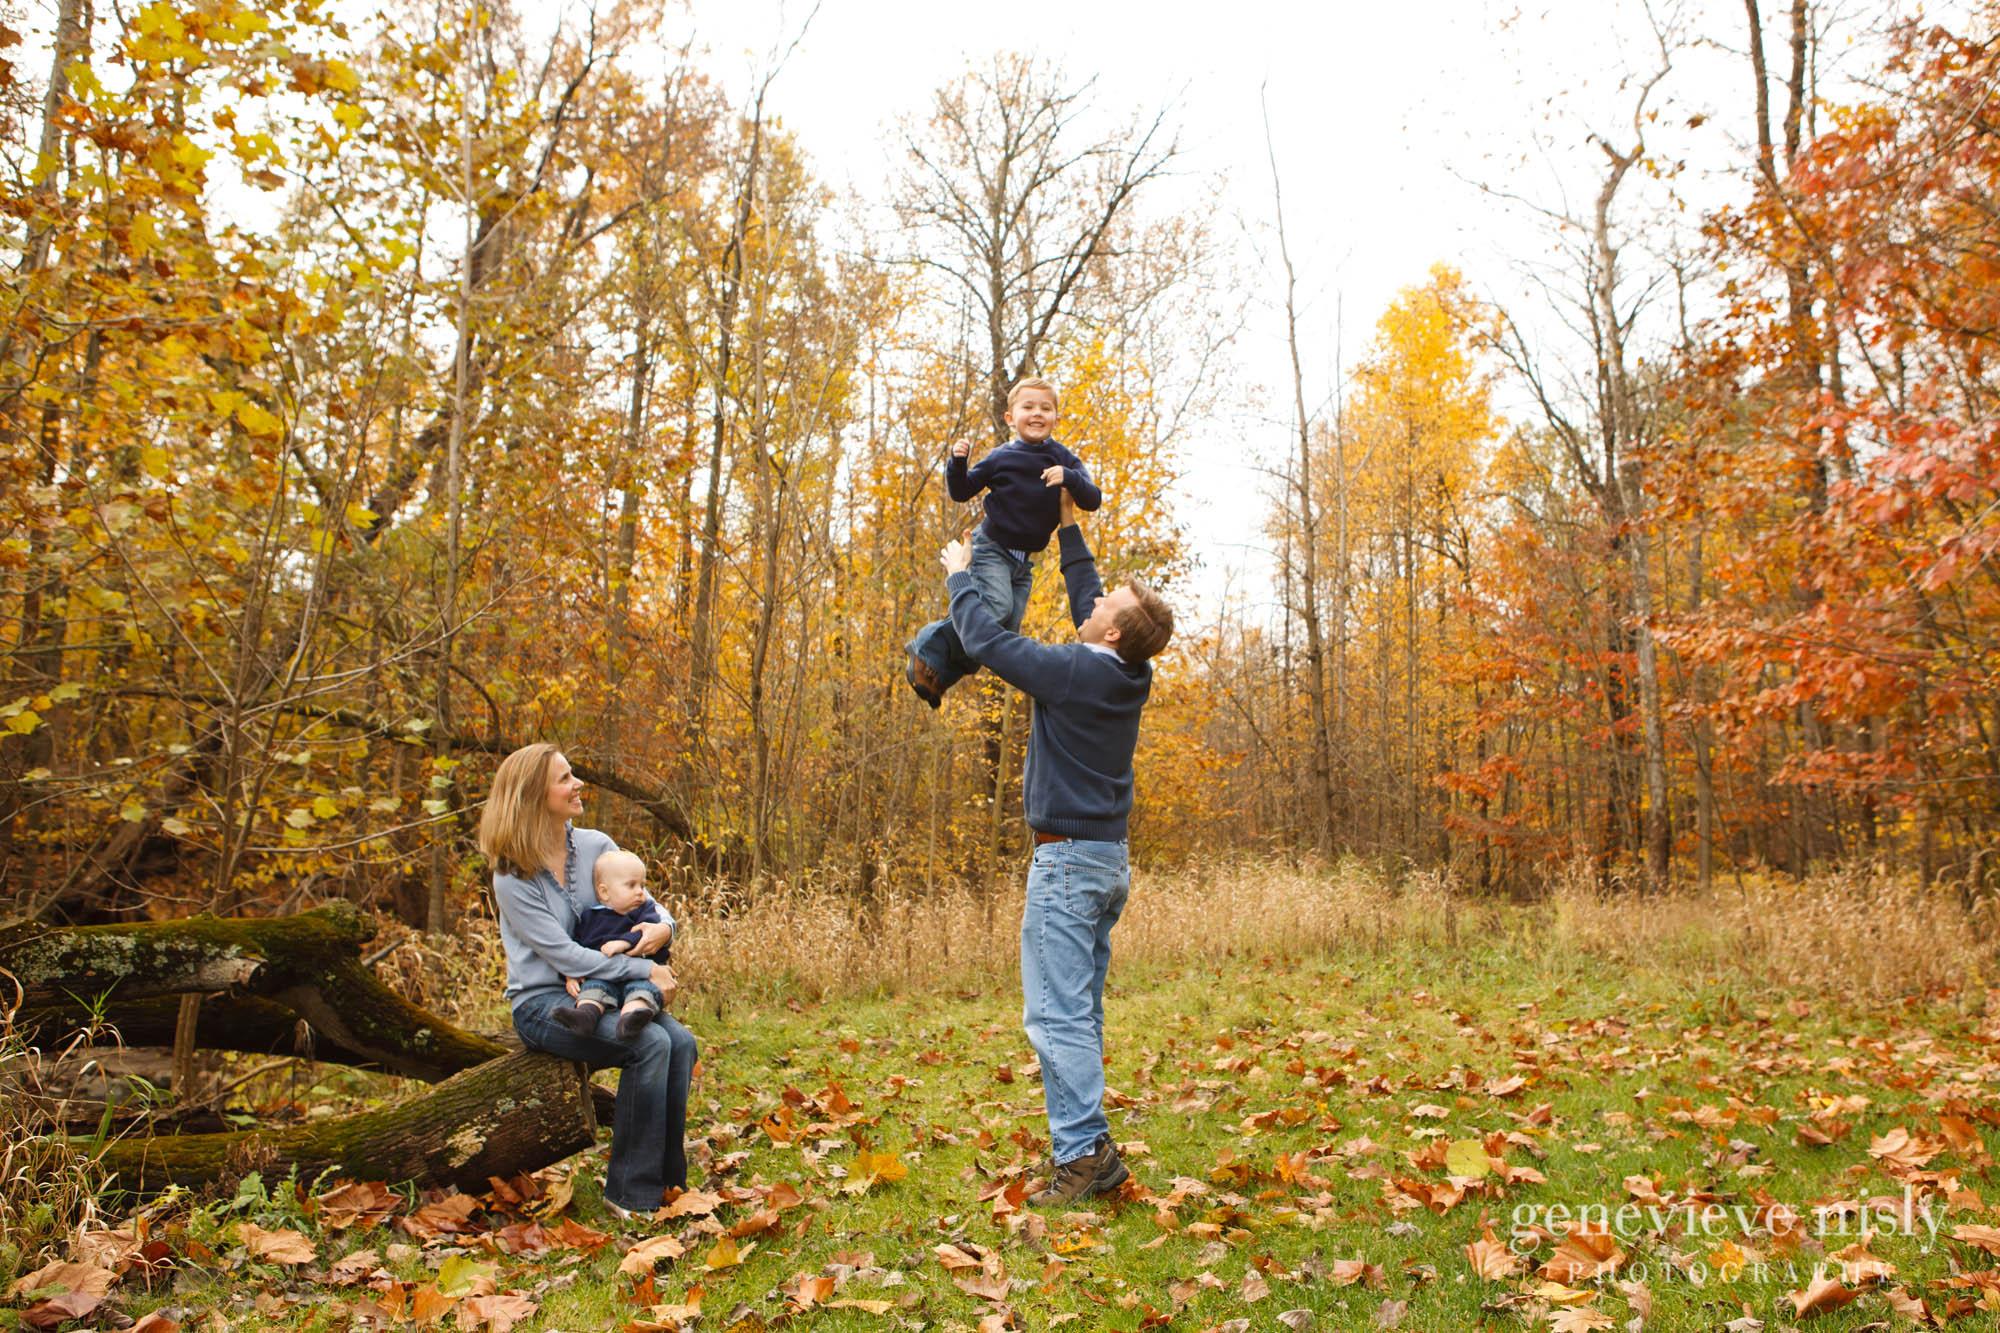 Copyright Genevieve Nisly Photography, Family, Portraits